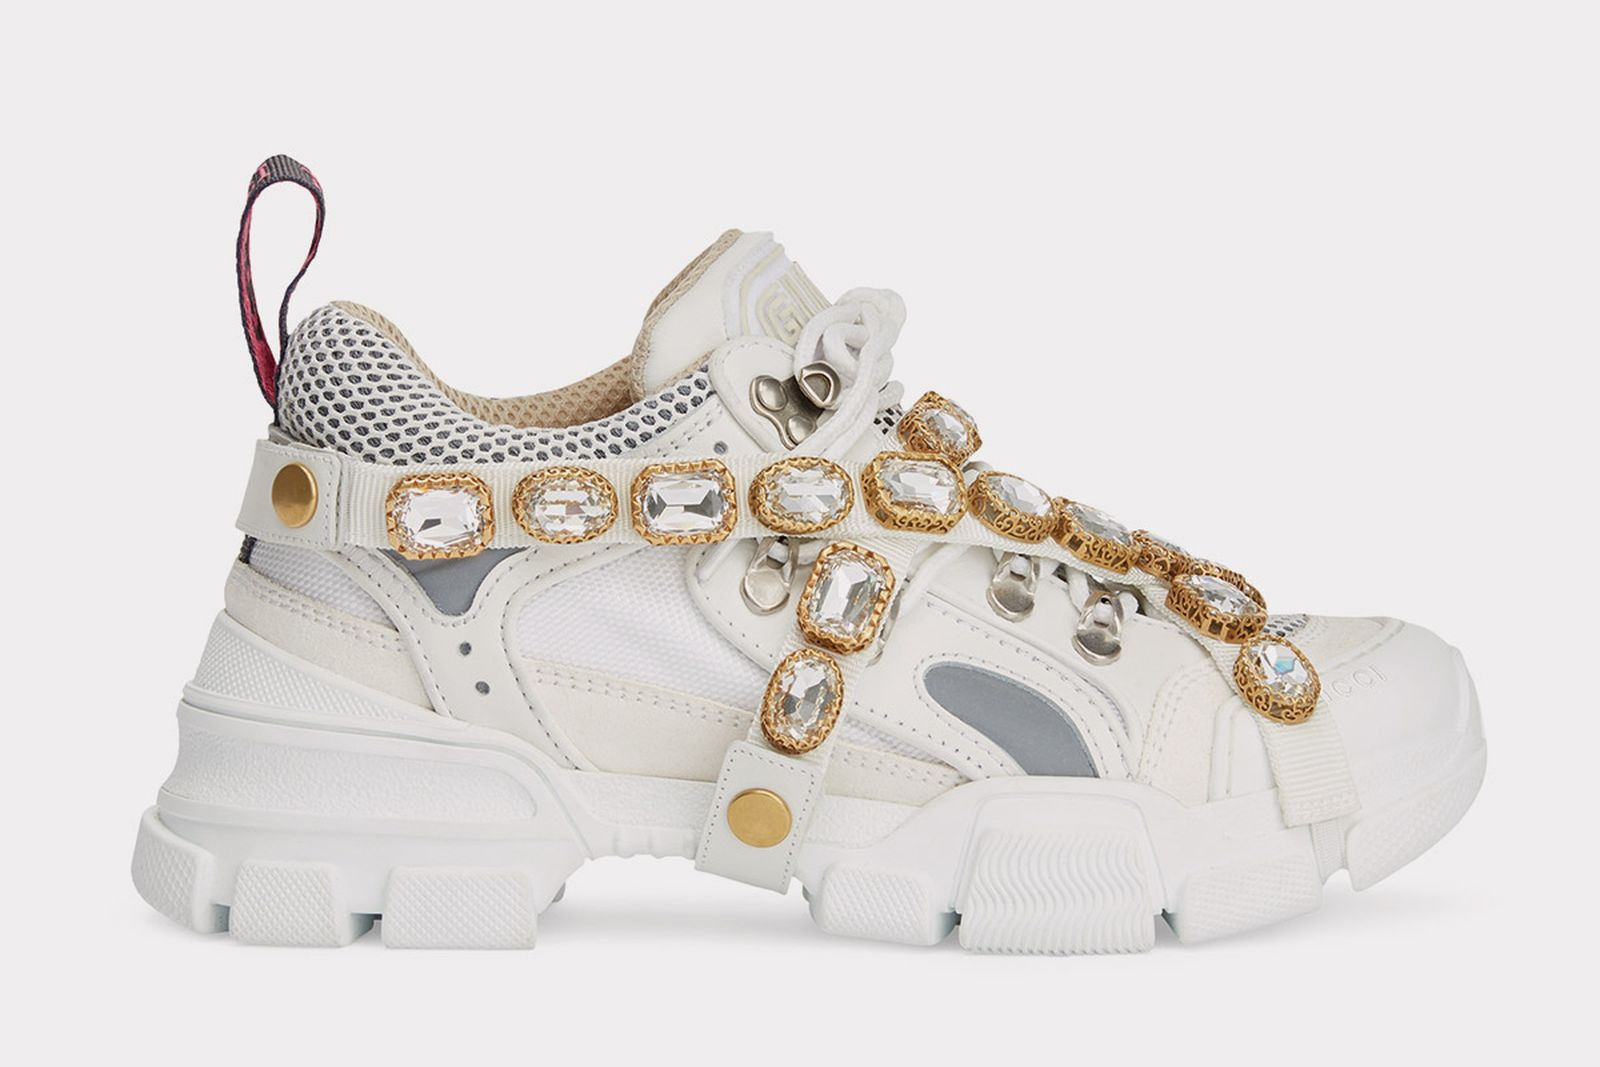 gucci-sega-crystal-sneaker-release-price-03